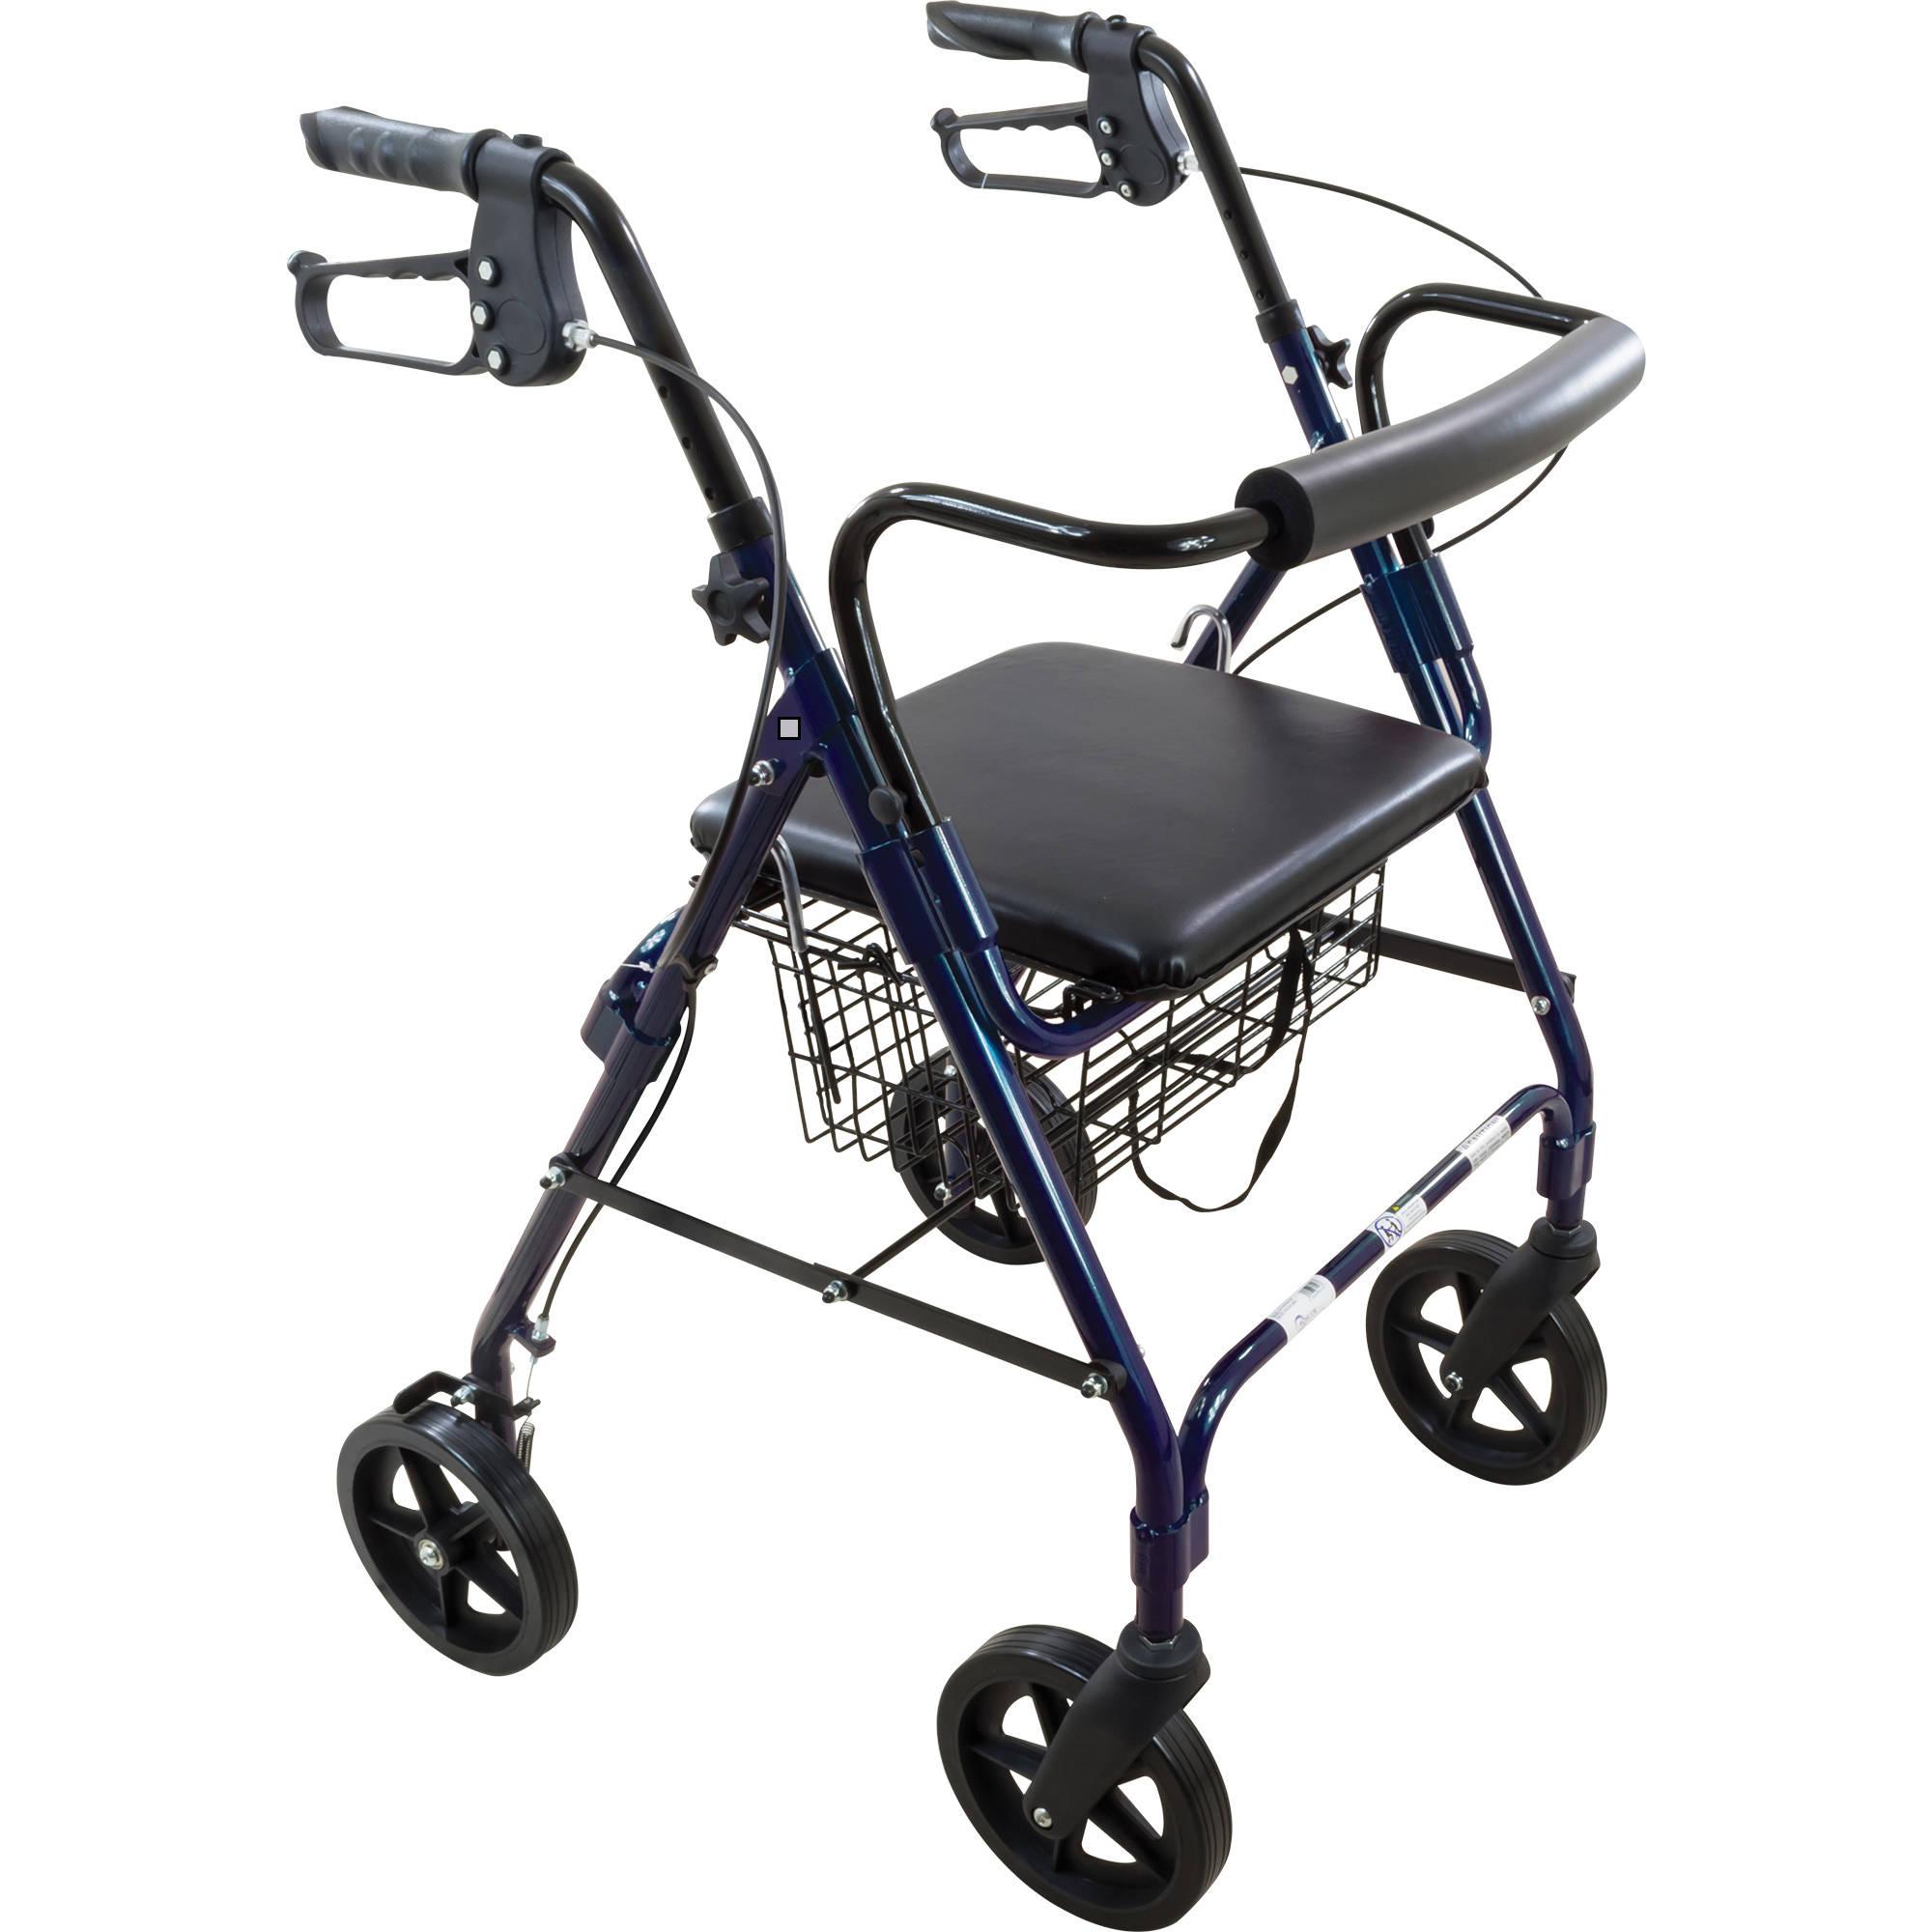 "Roscoe Deluxe 8"" Wheel Rollator / Rolling Walker with Padded Seat - Blue"